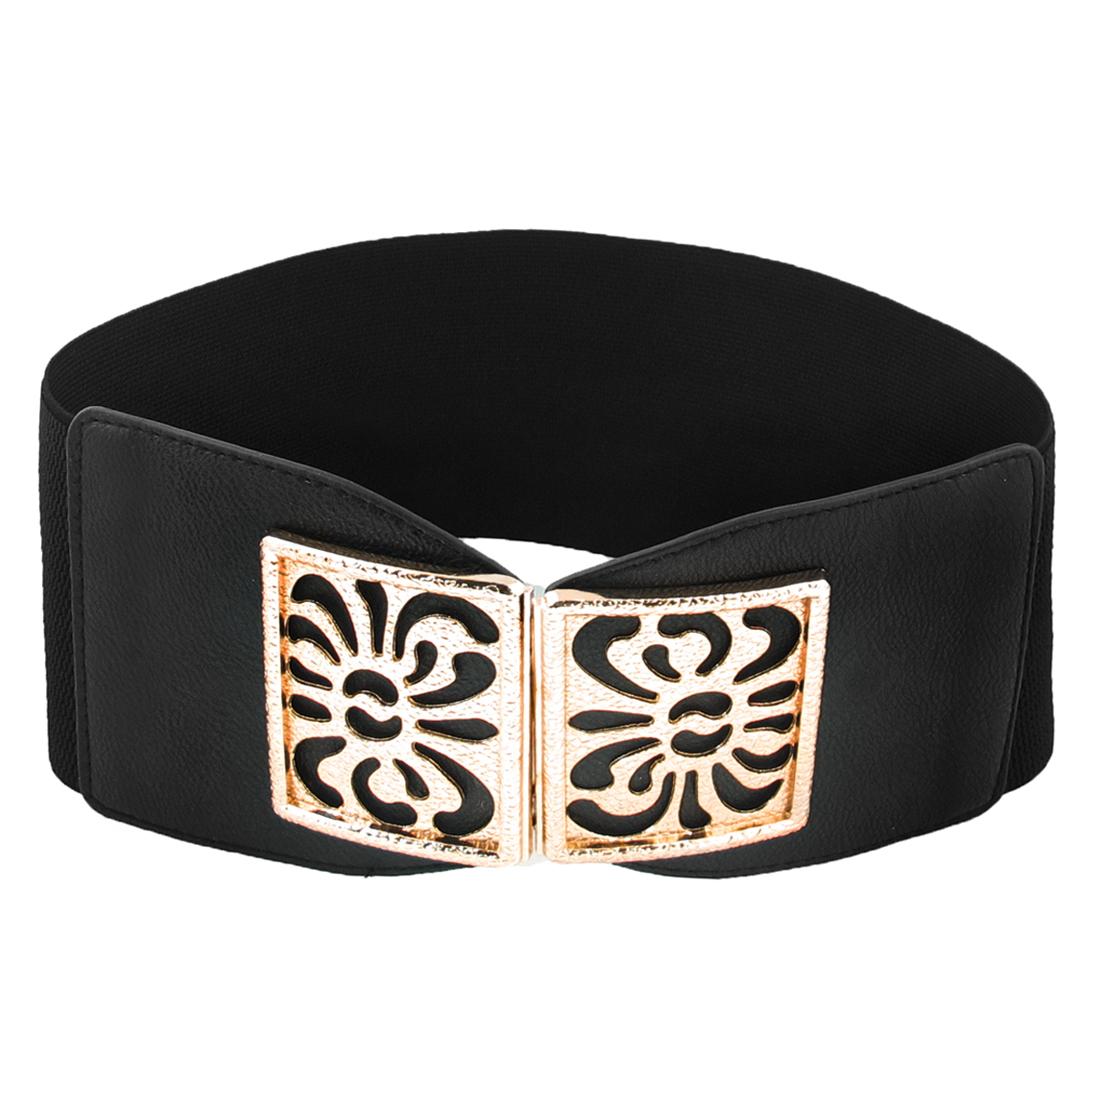 Lady Rectangle Interlocking Buckle Stretch High Waist Belt 10cm Width Black